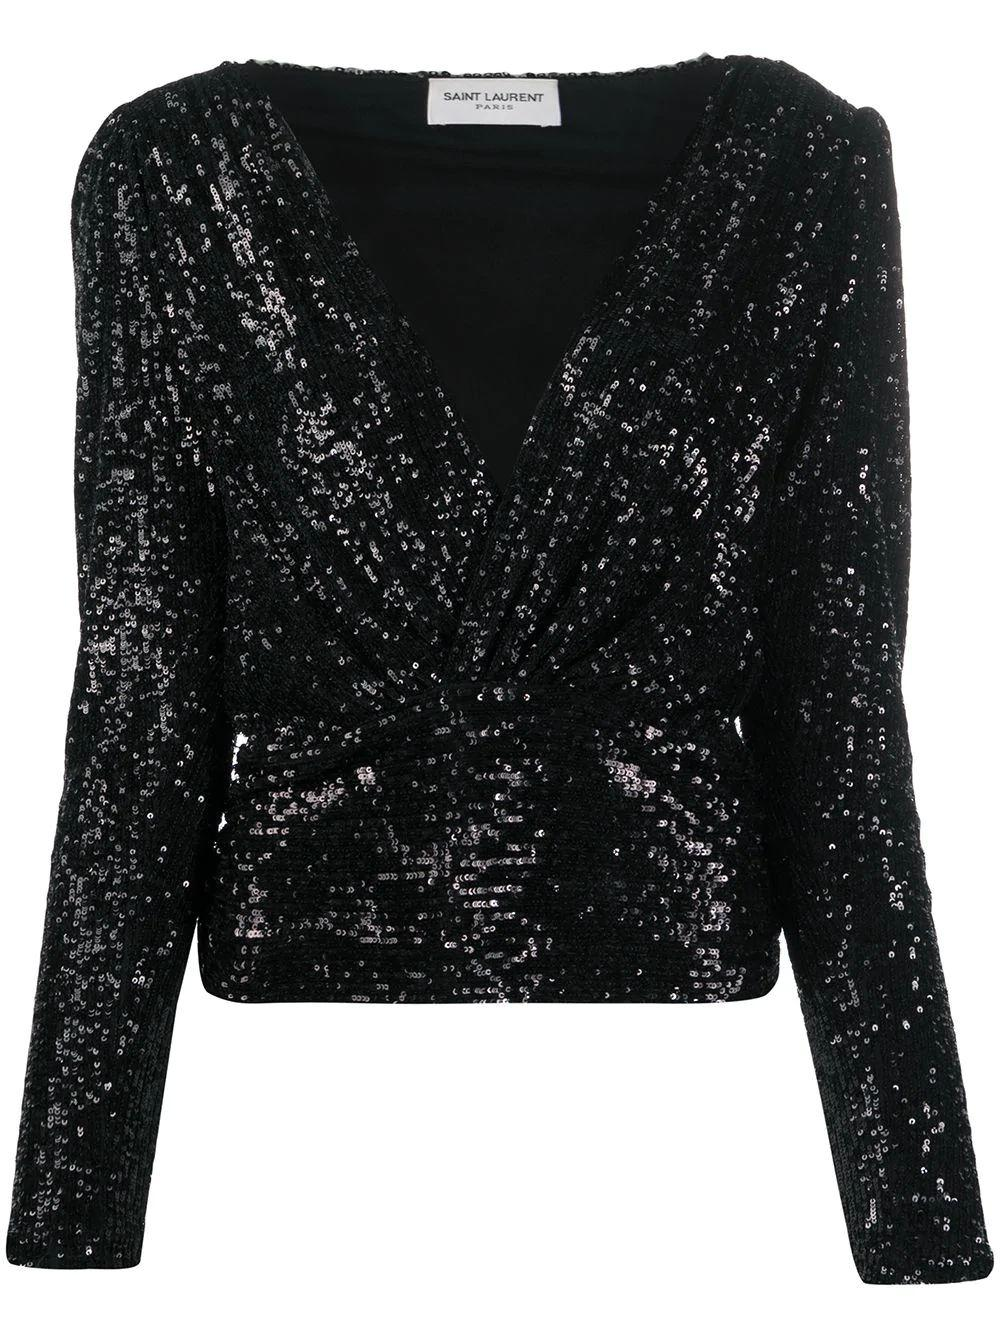 Long Sleeve Sequined Jersey Top Item # 619394YBOK2